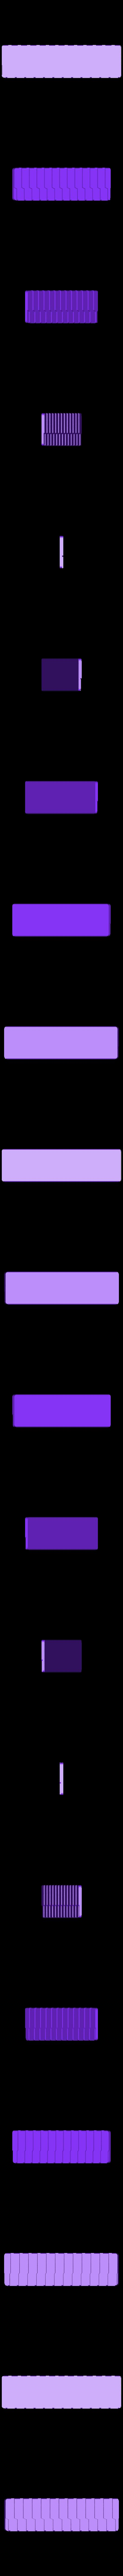 Circuit board.stl Download STL file Graflex Lightsaber • Template to 3D print, DanielJosvai